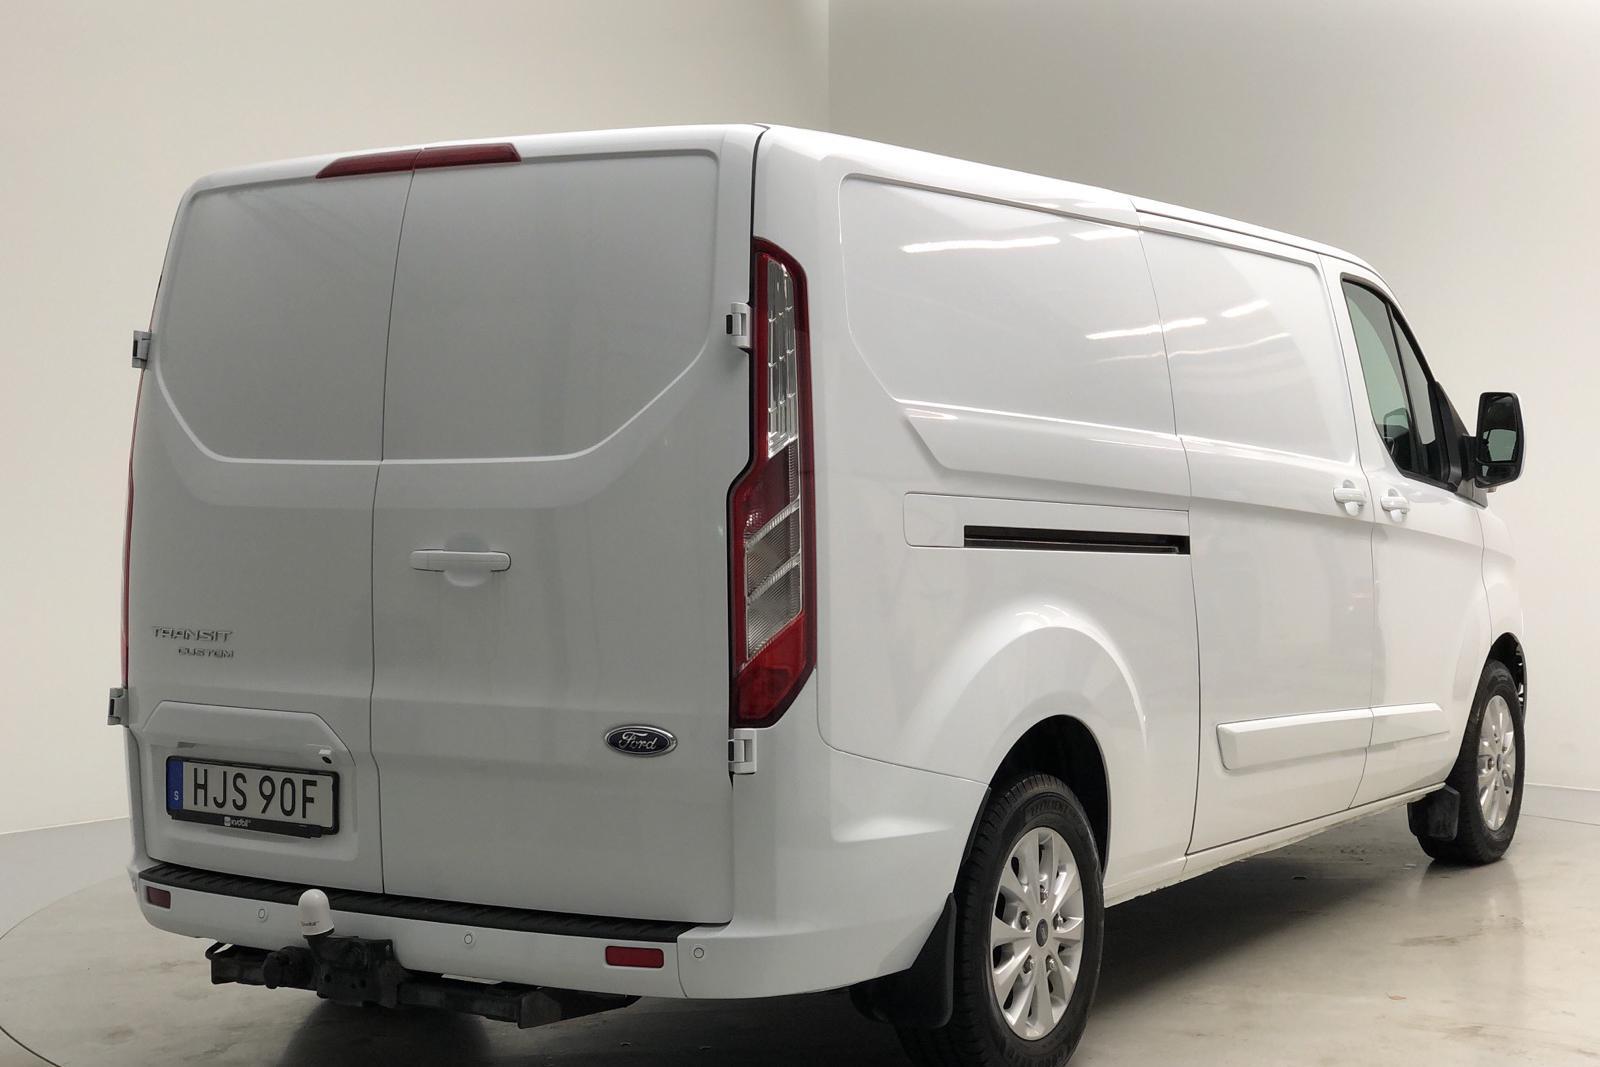 Ford Transit Custom 300 (130hk) - 0 km - Manual - white - 2019